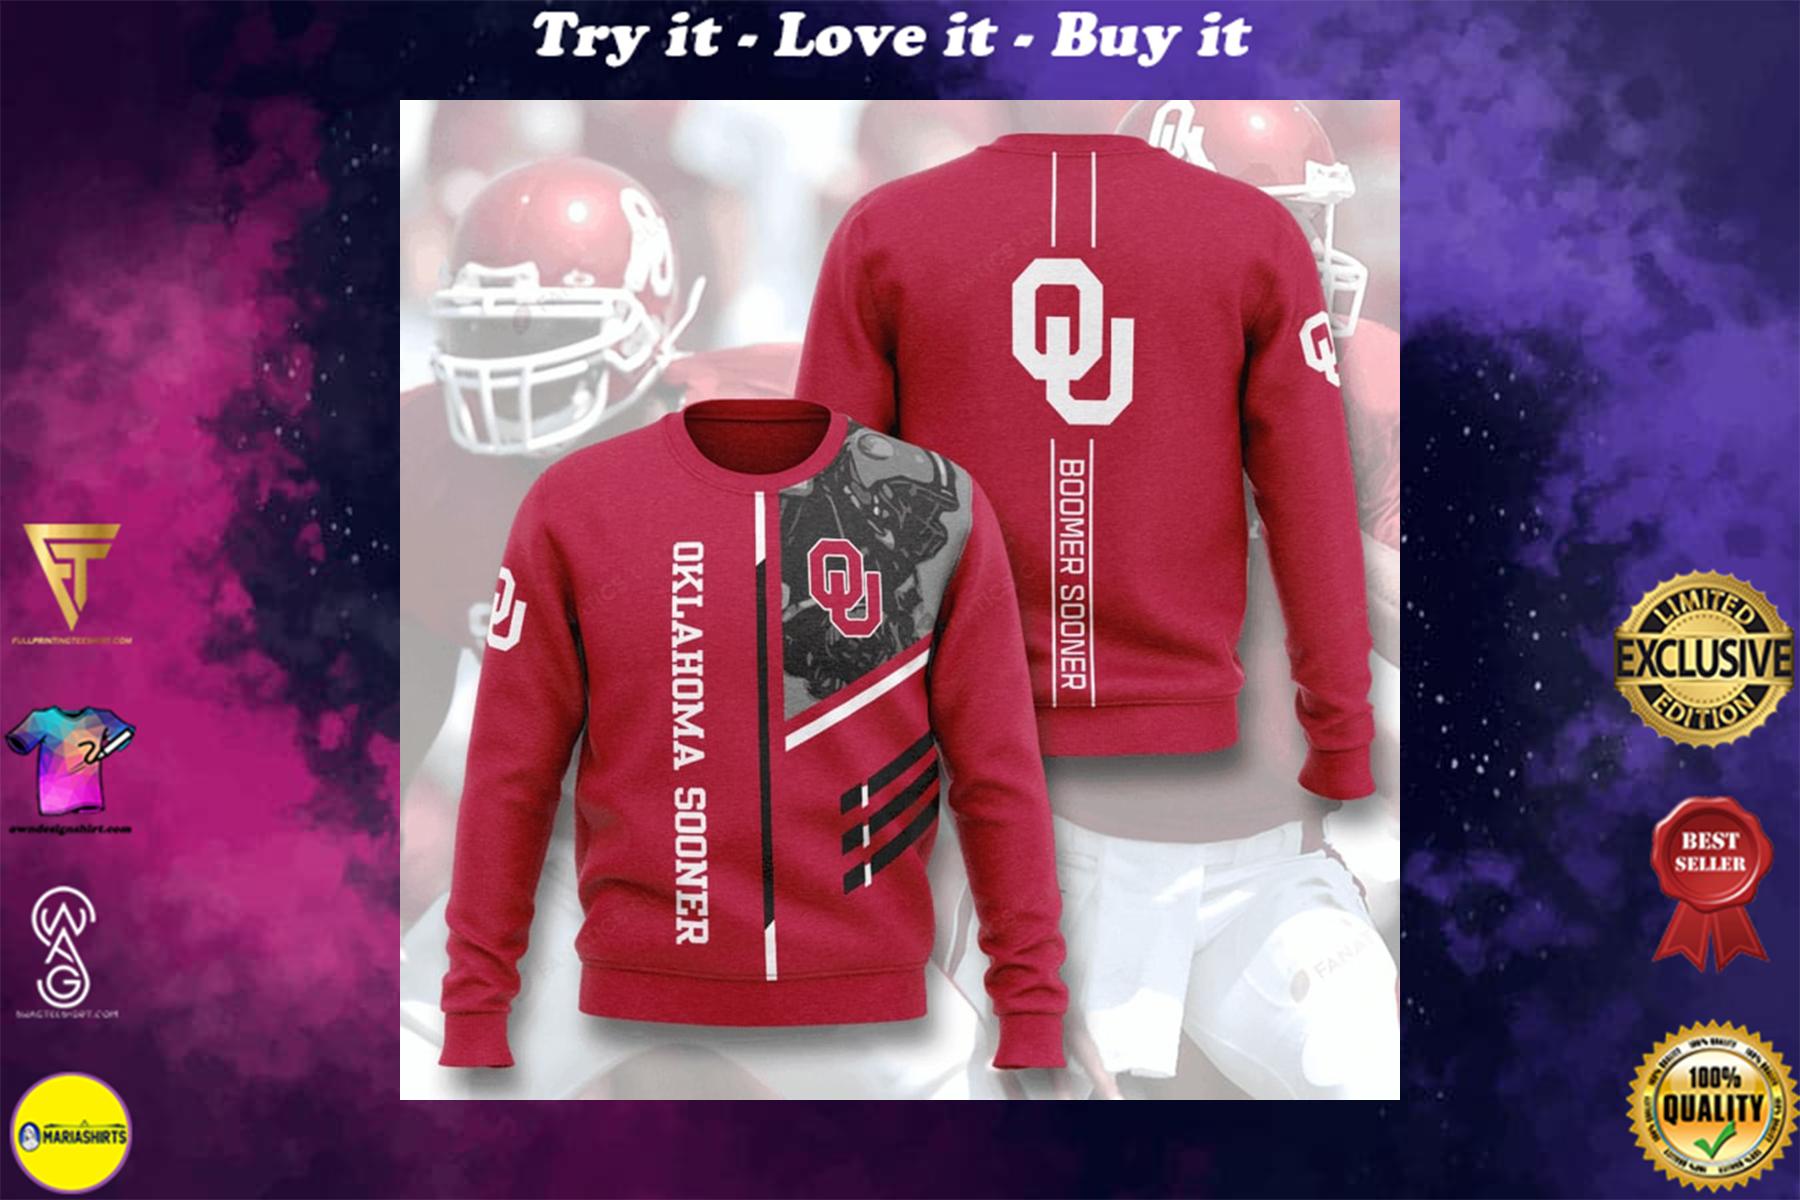 [highest selling] oklahoma sooners boomer sooner full printing ugly sweater - maria